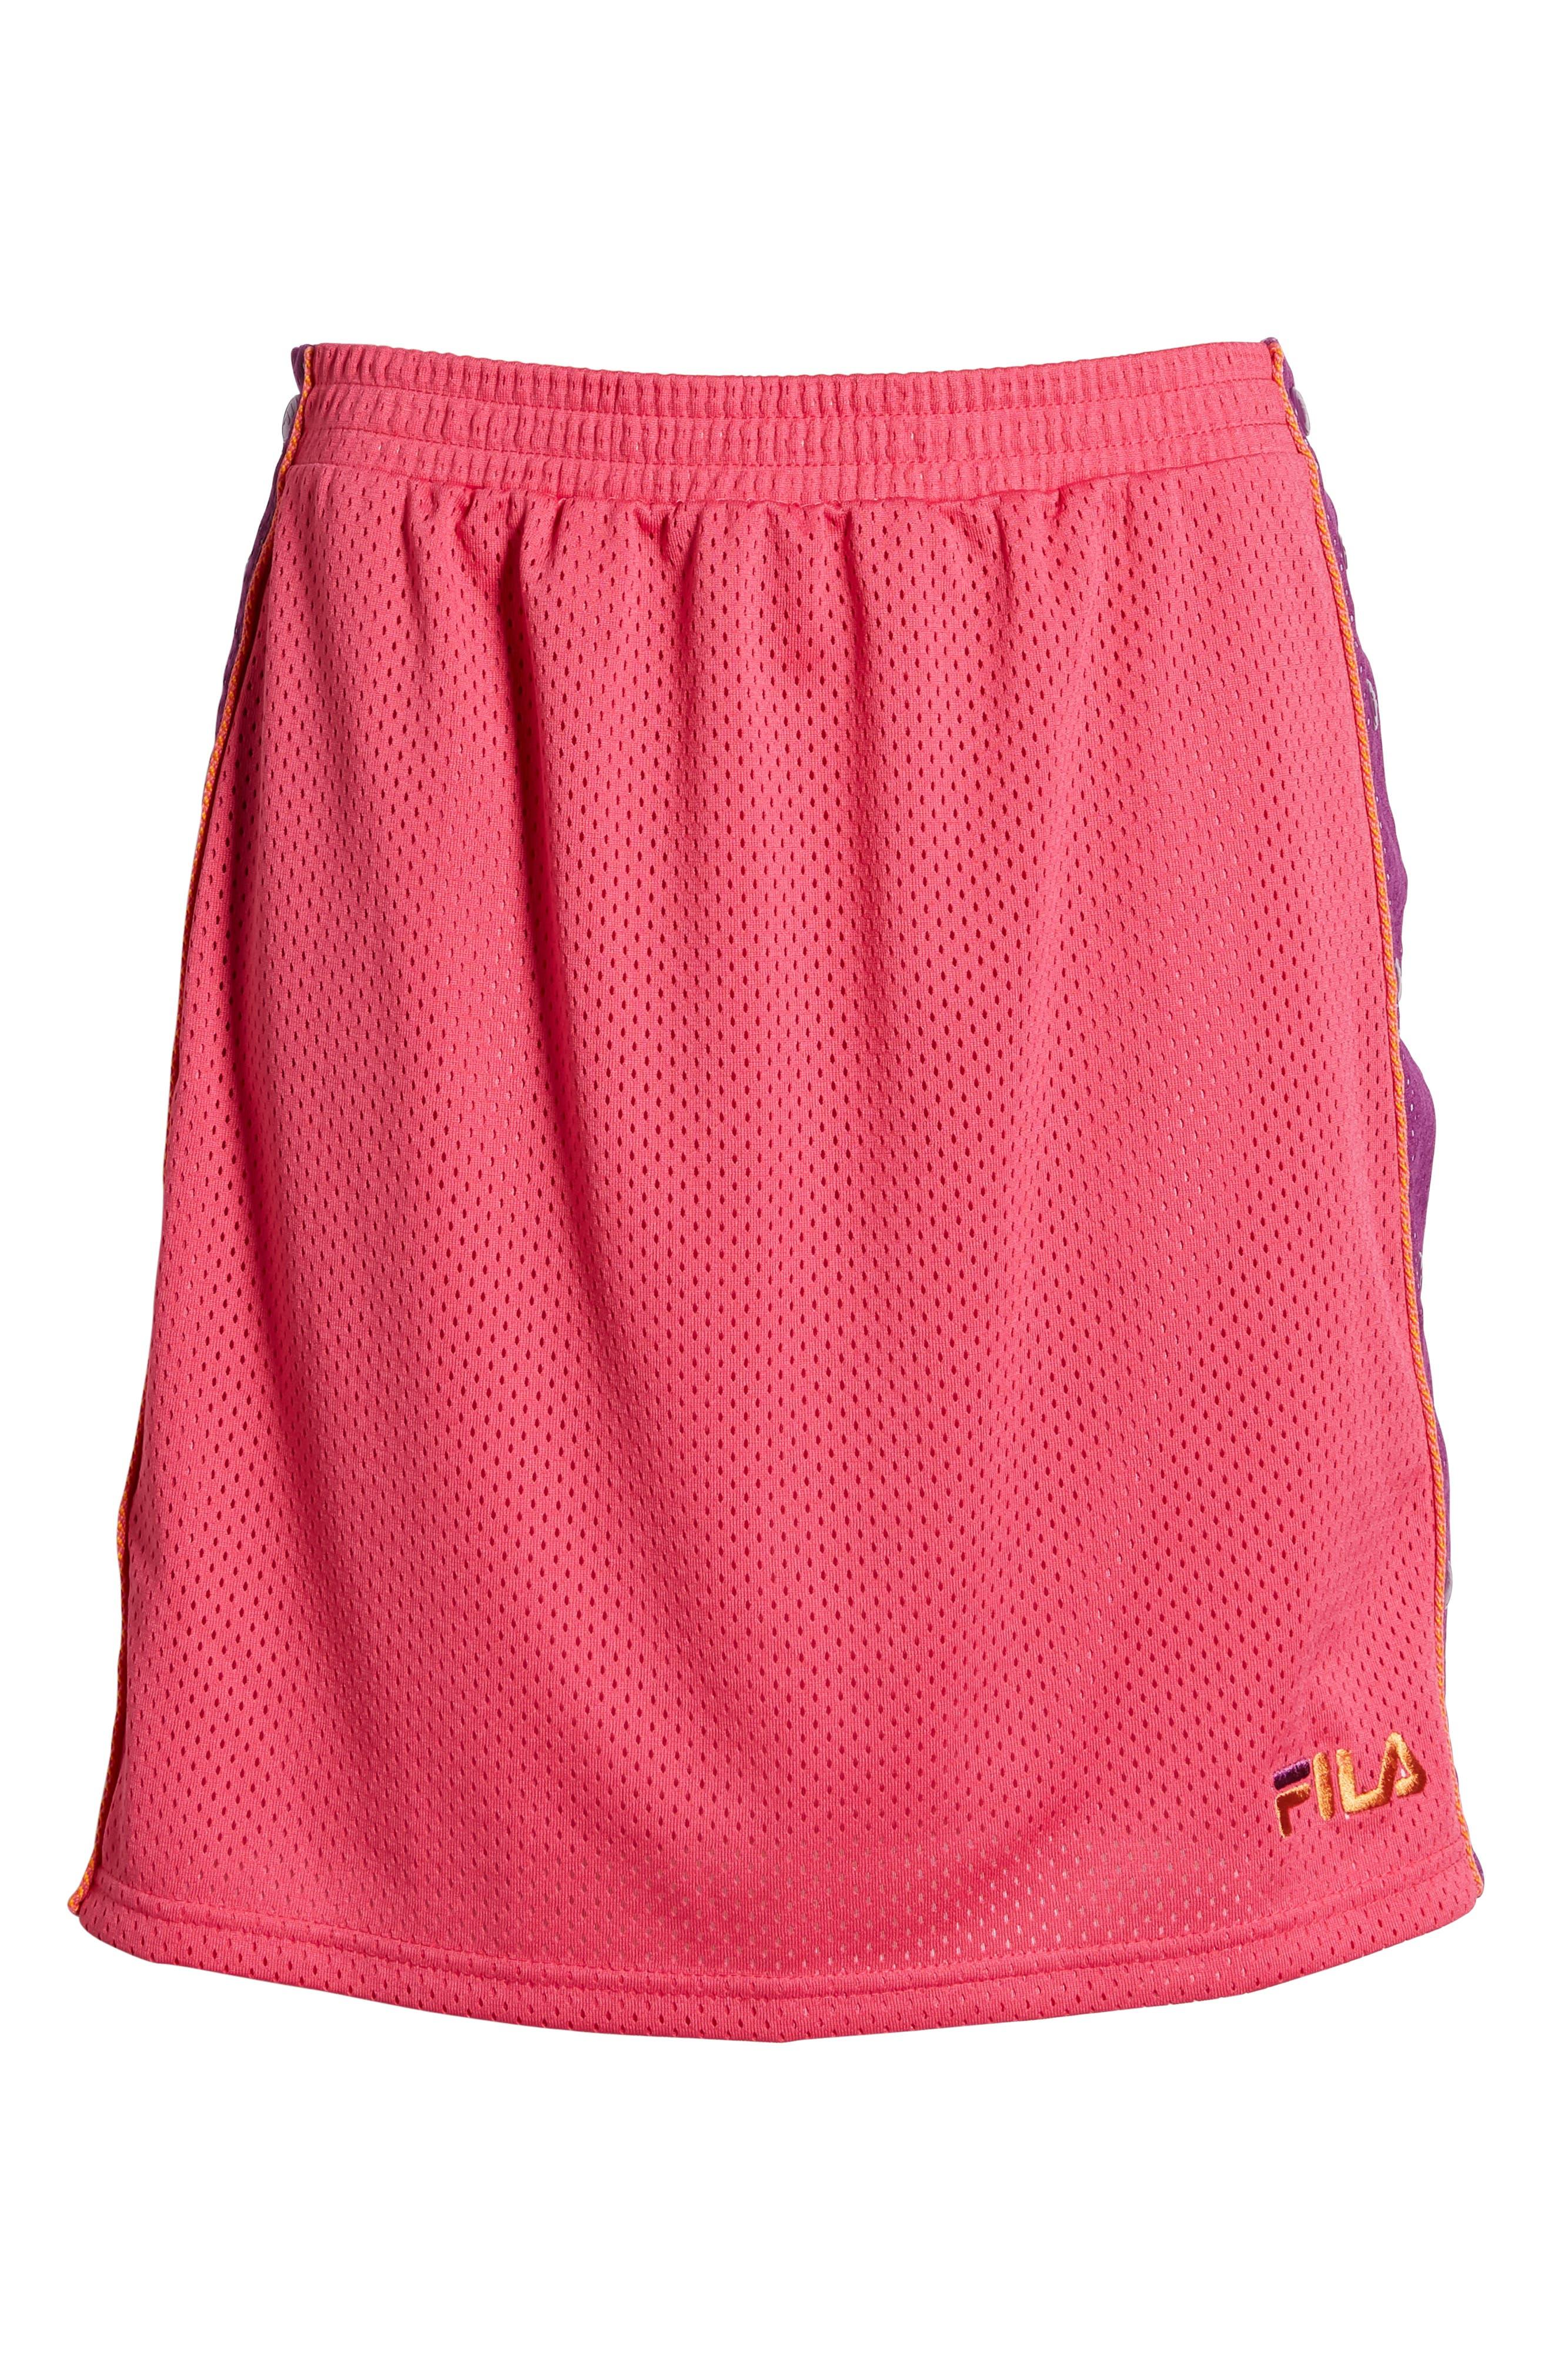 FILA, Miriam Tearaway Miniskirt, Alternate thumbnail 7, color, FUCHSIA PURPLE/ GRAPE/ GREEN